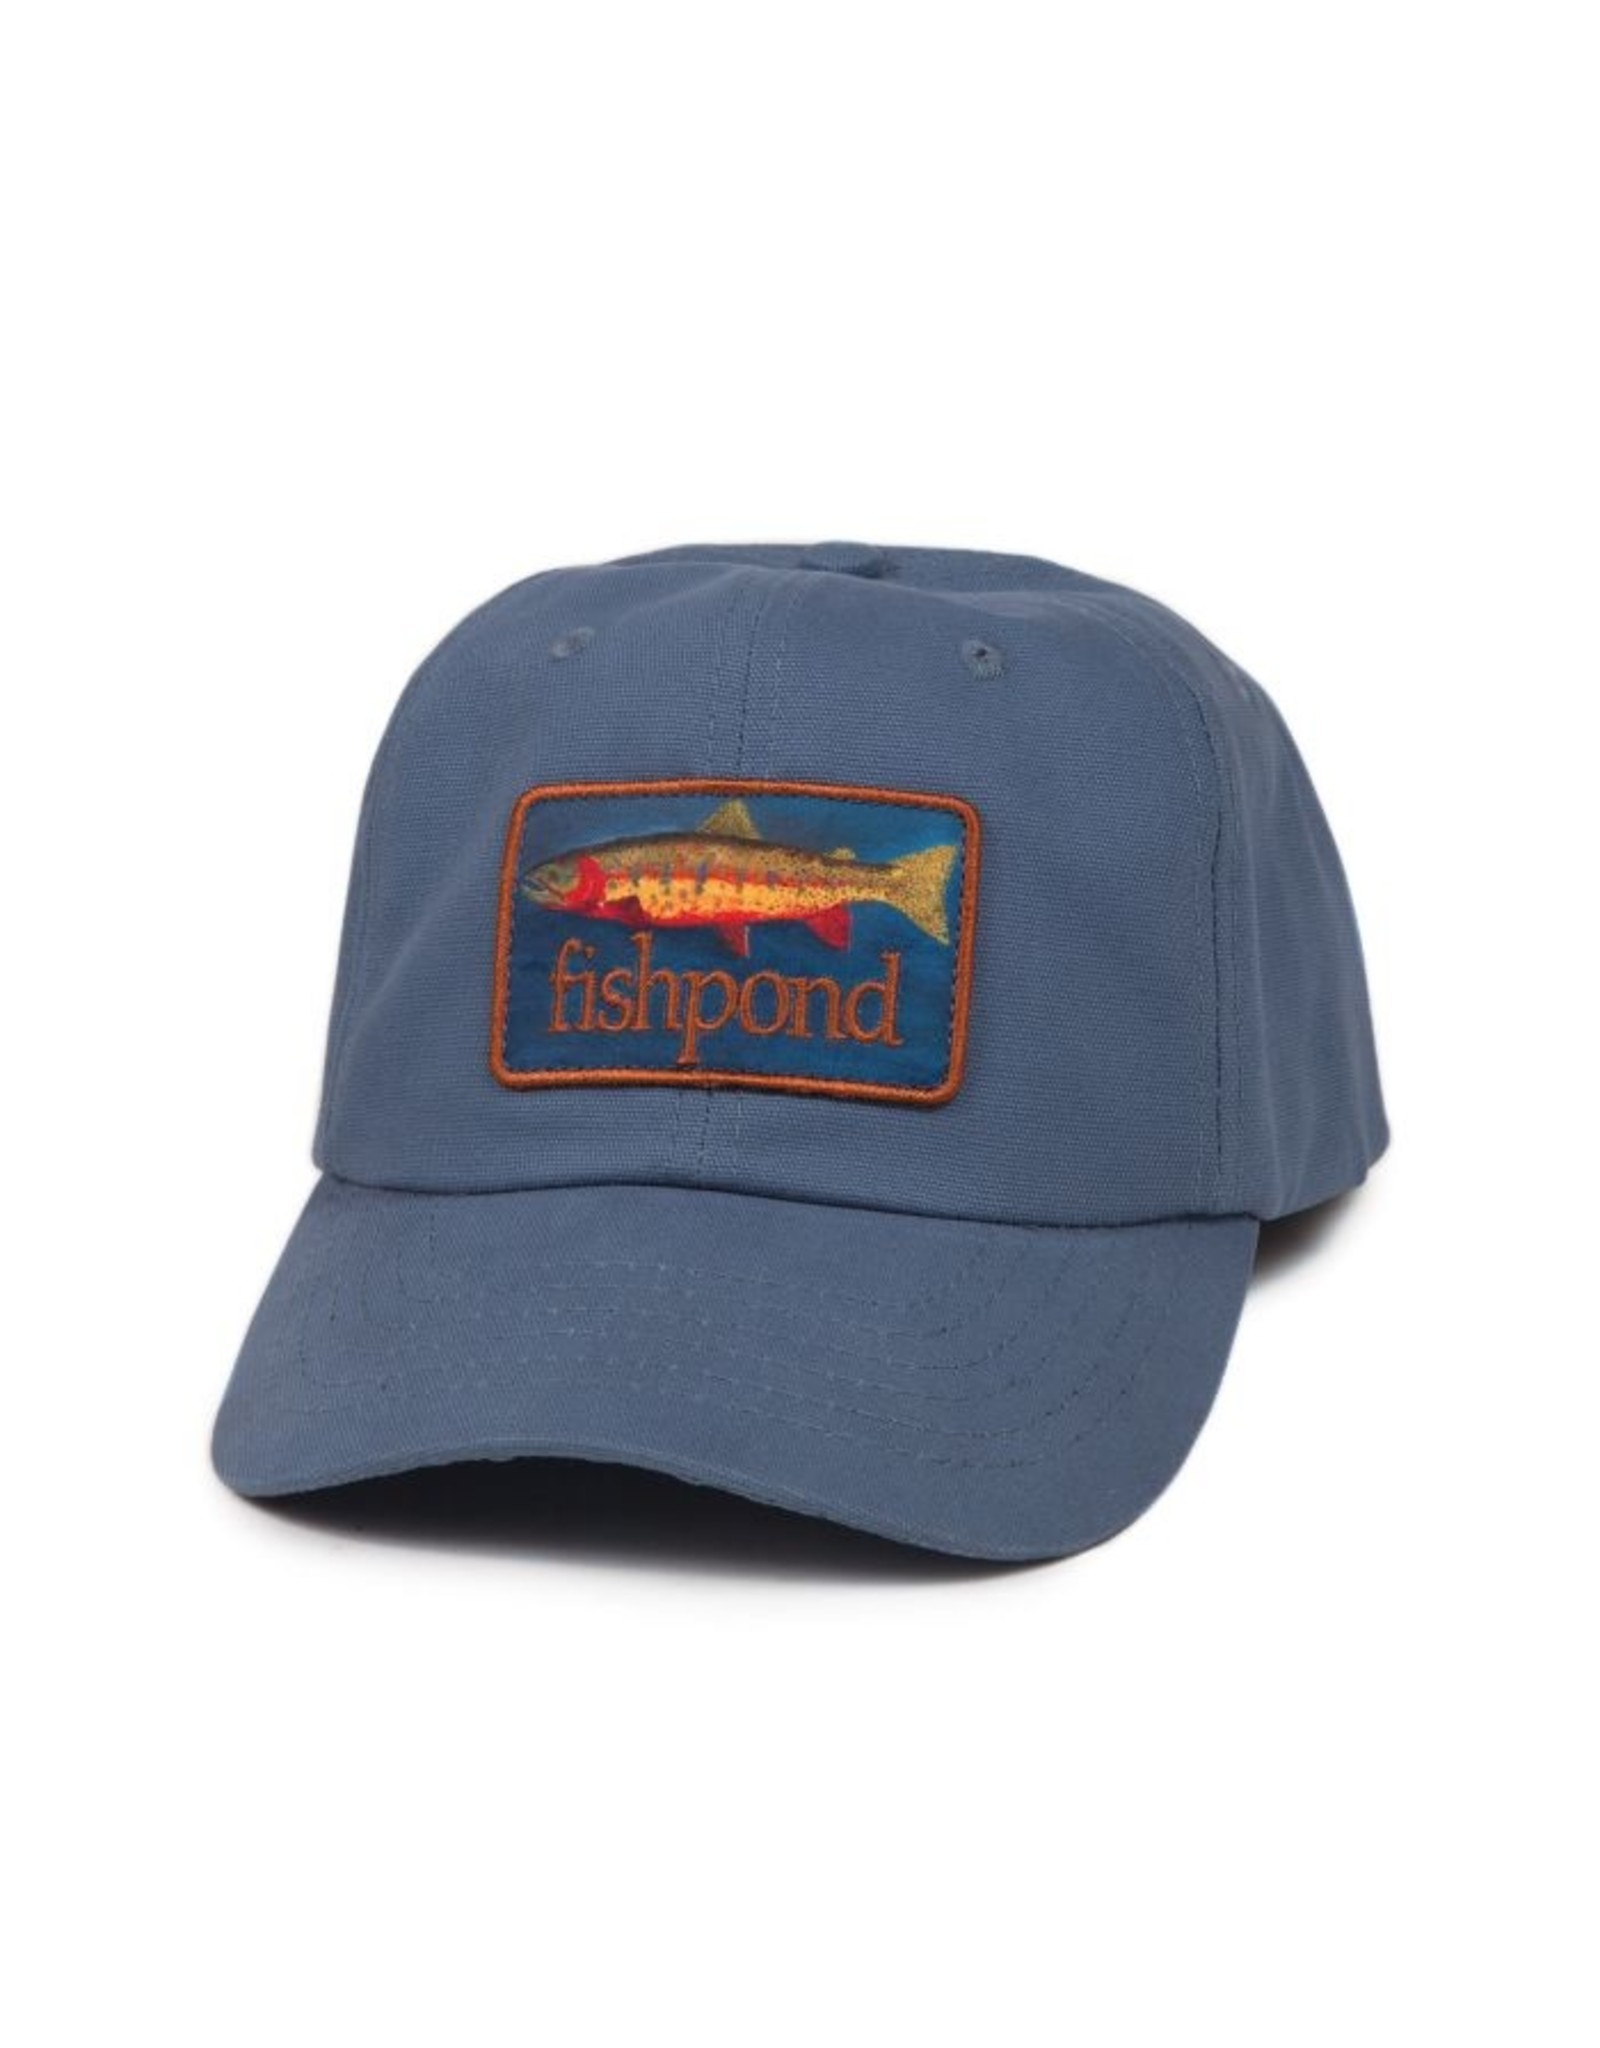 Fishpond Fishpond - Lecoqelton Trout Hat